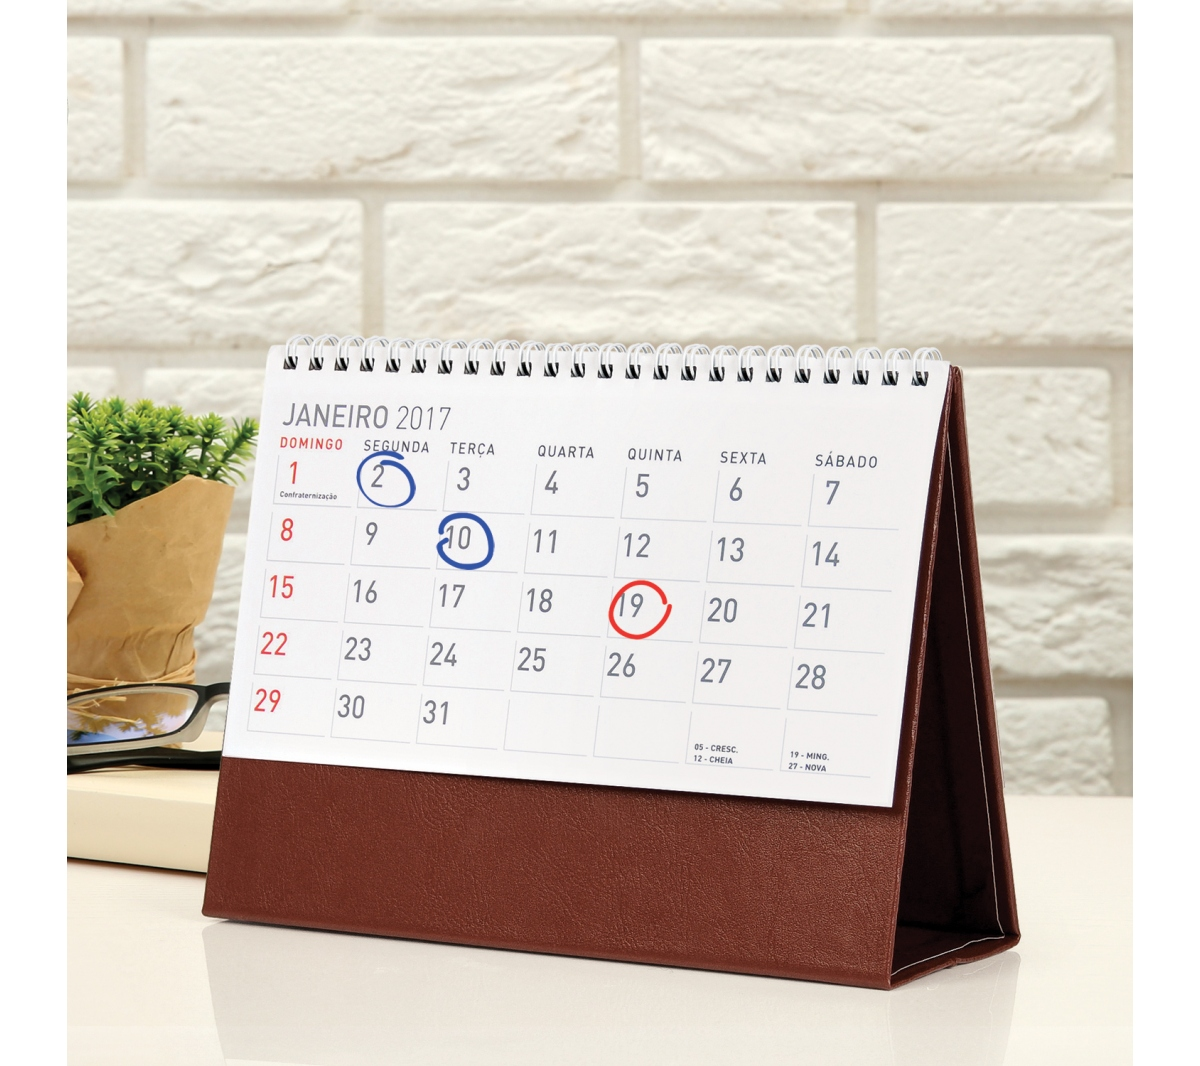 Brinde calend rio de mesa executivo flic brindes - Calendario de mesa ...